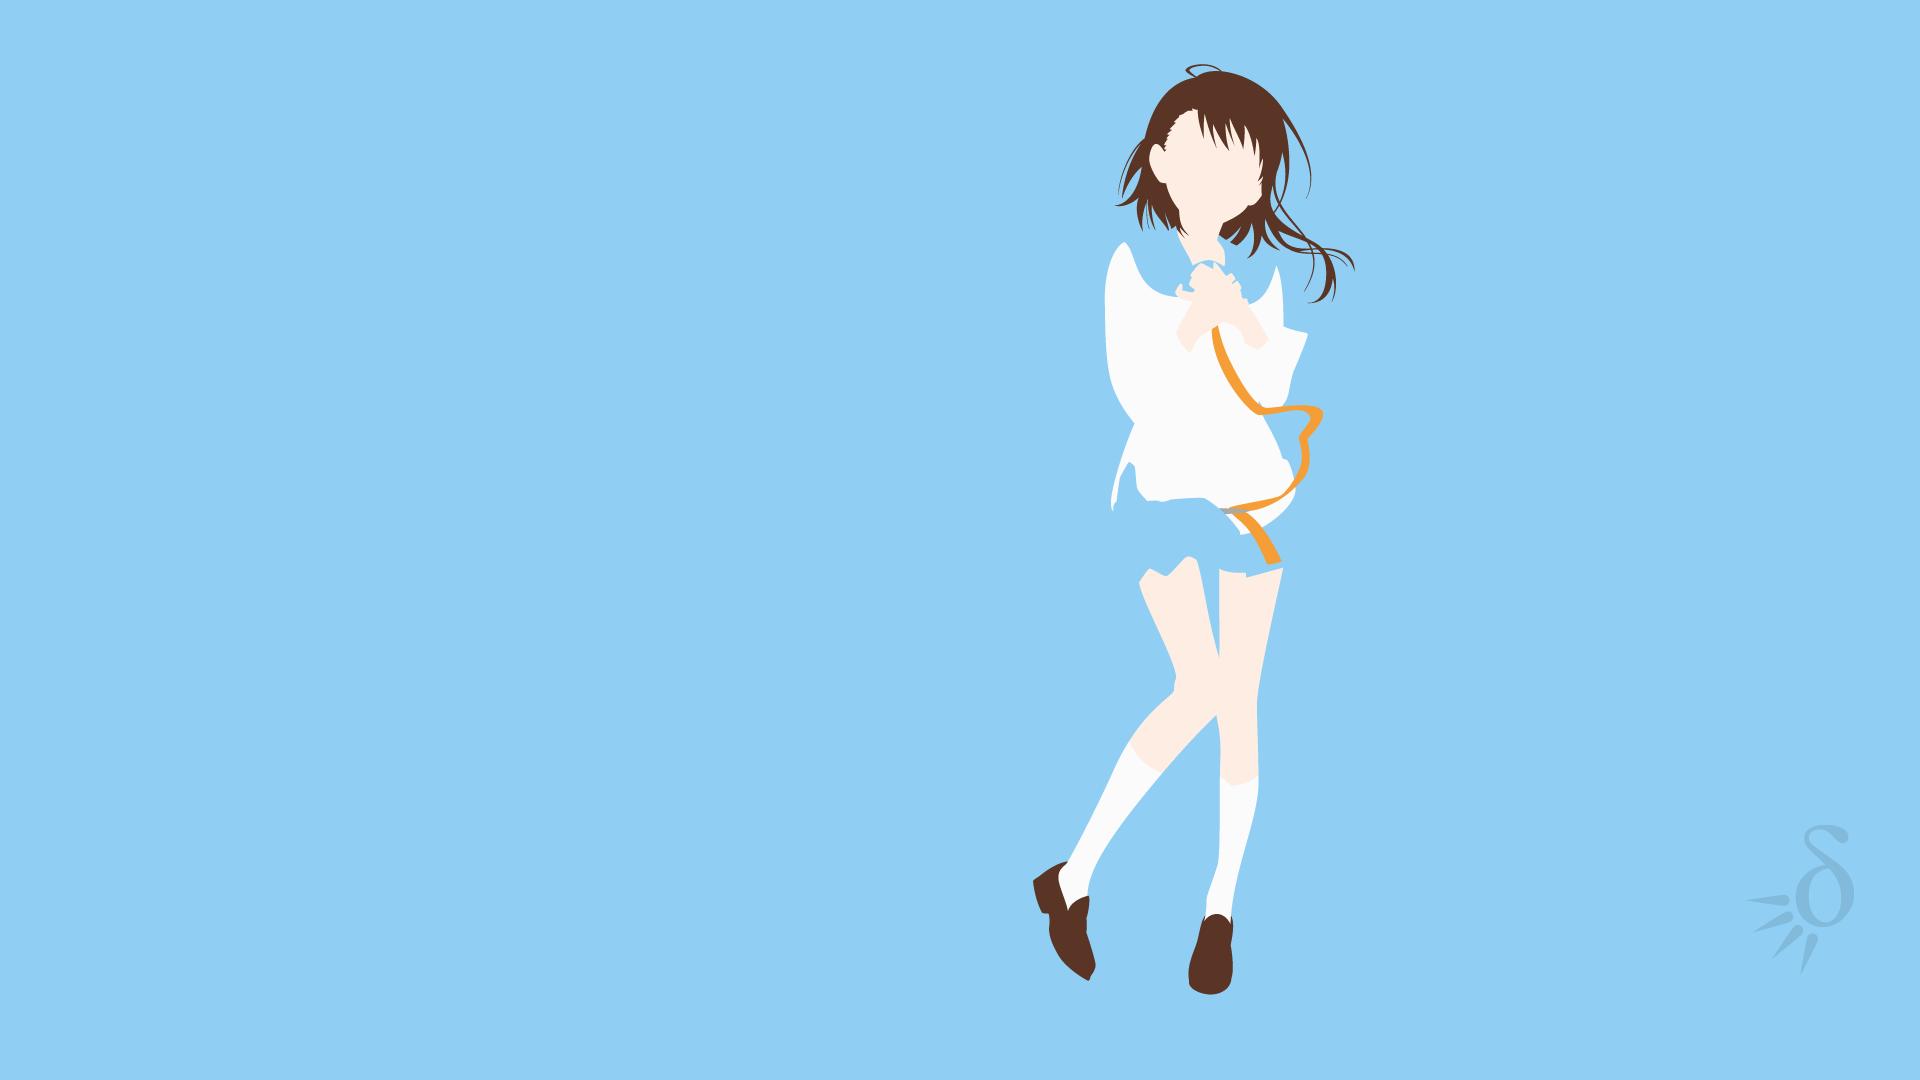 Wallpaper Nisekoi Vector Onodera Kosaki Anime Vectors Anime Girls 1920x1080 Junp31 1368073 Hd Wallpapers Wallhere